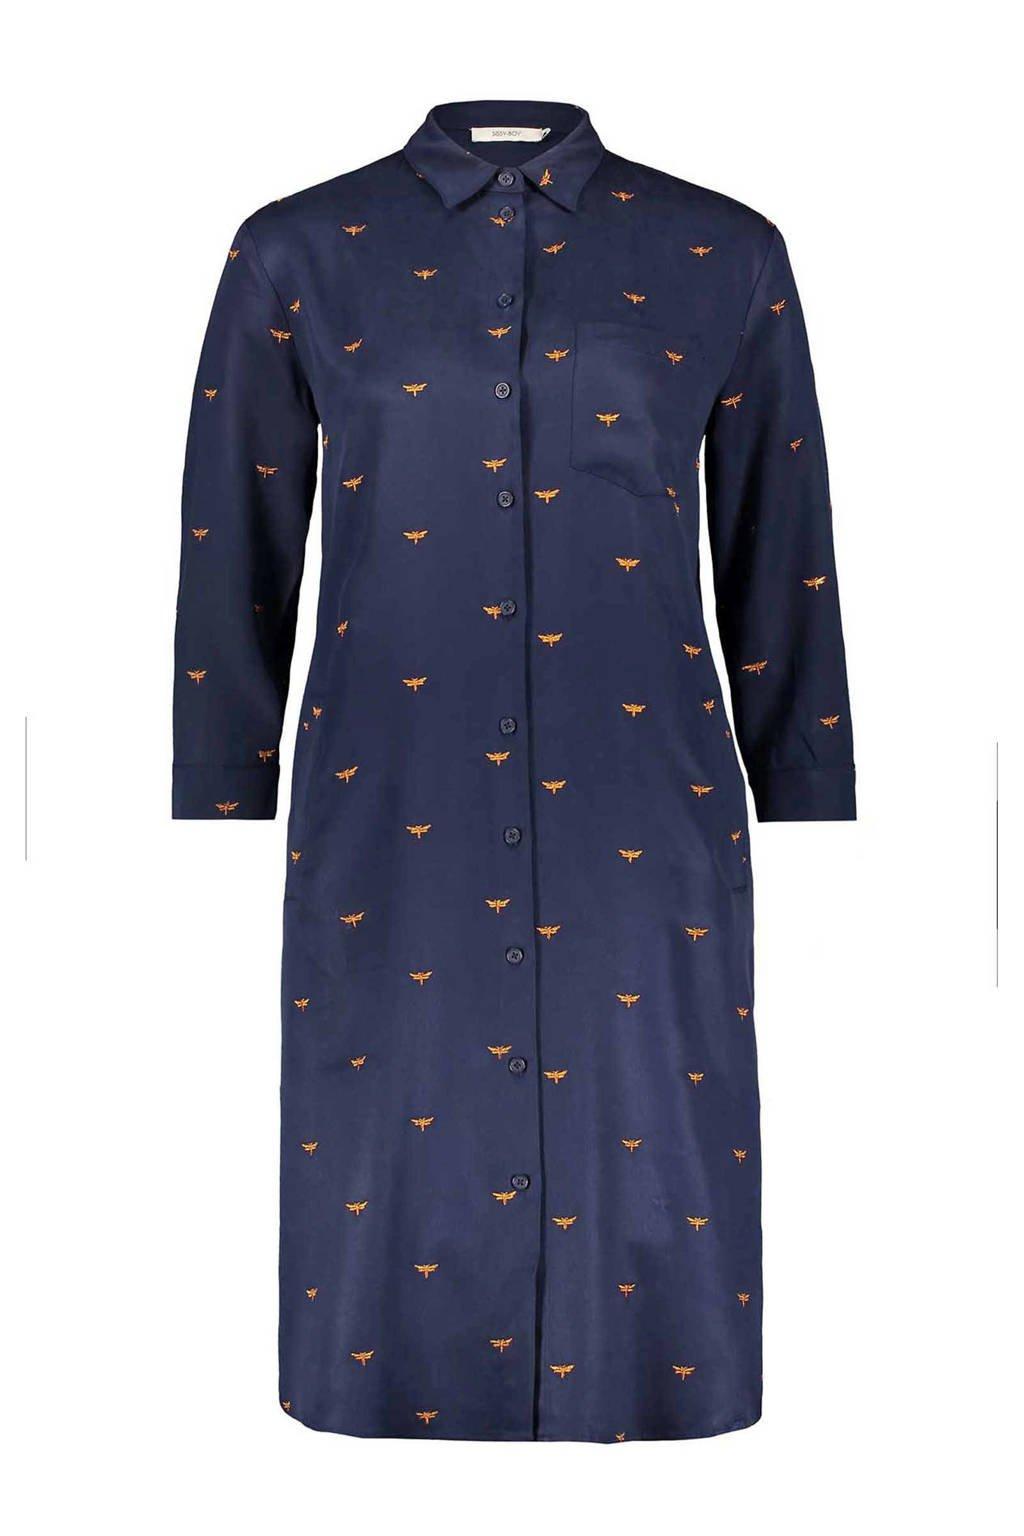 3ac2886175141b Sissy-Boy blouse jurk met allover print blauw